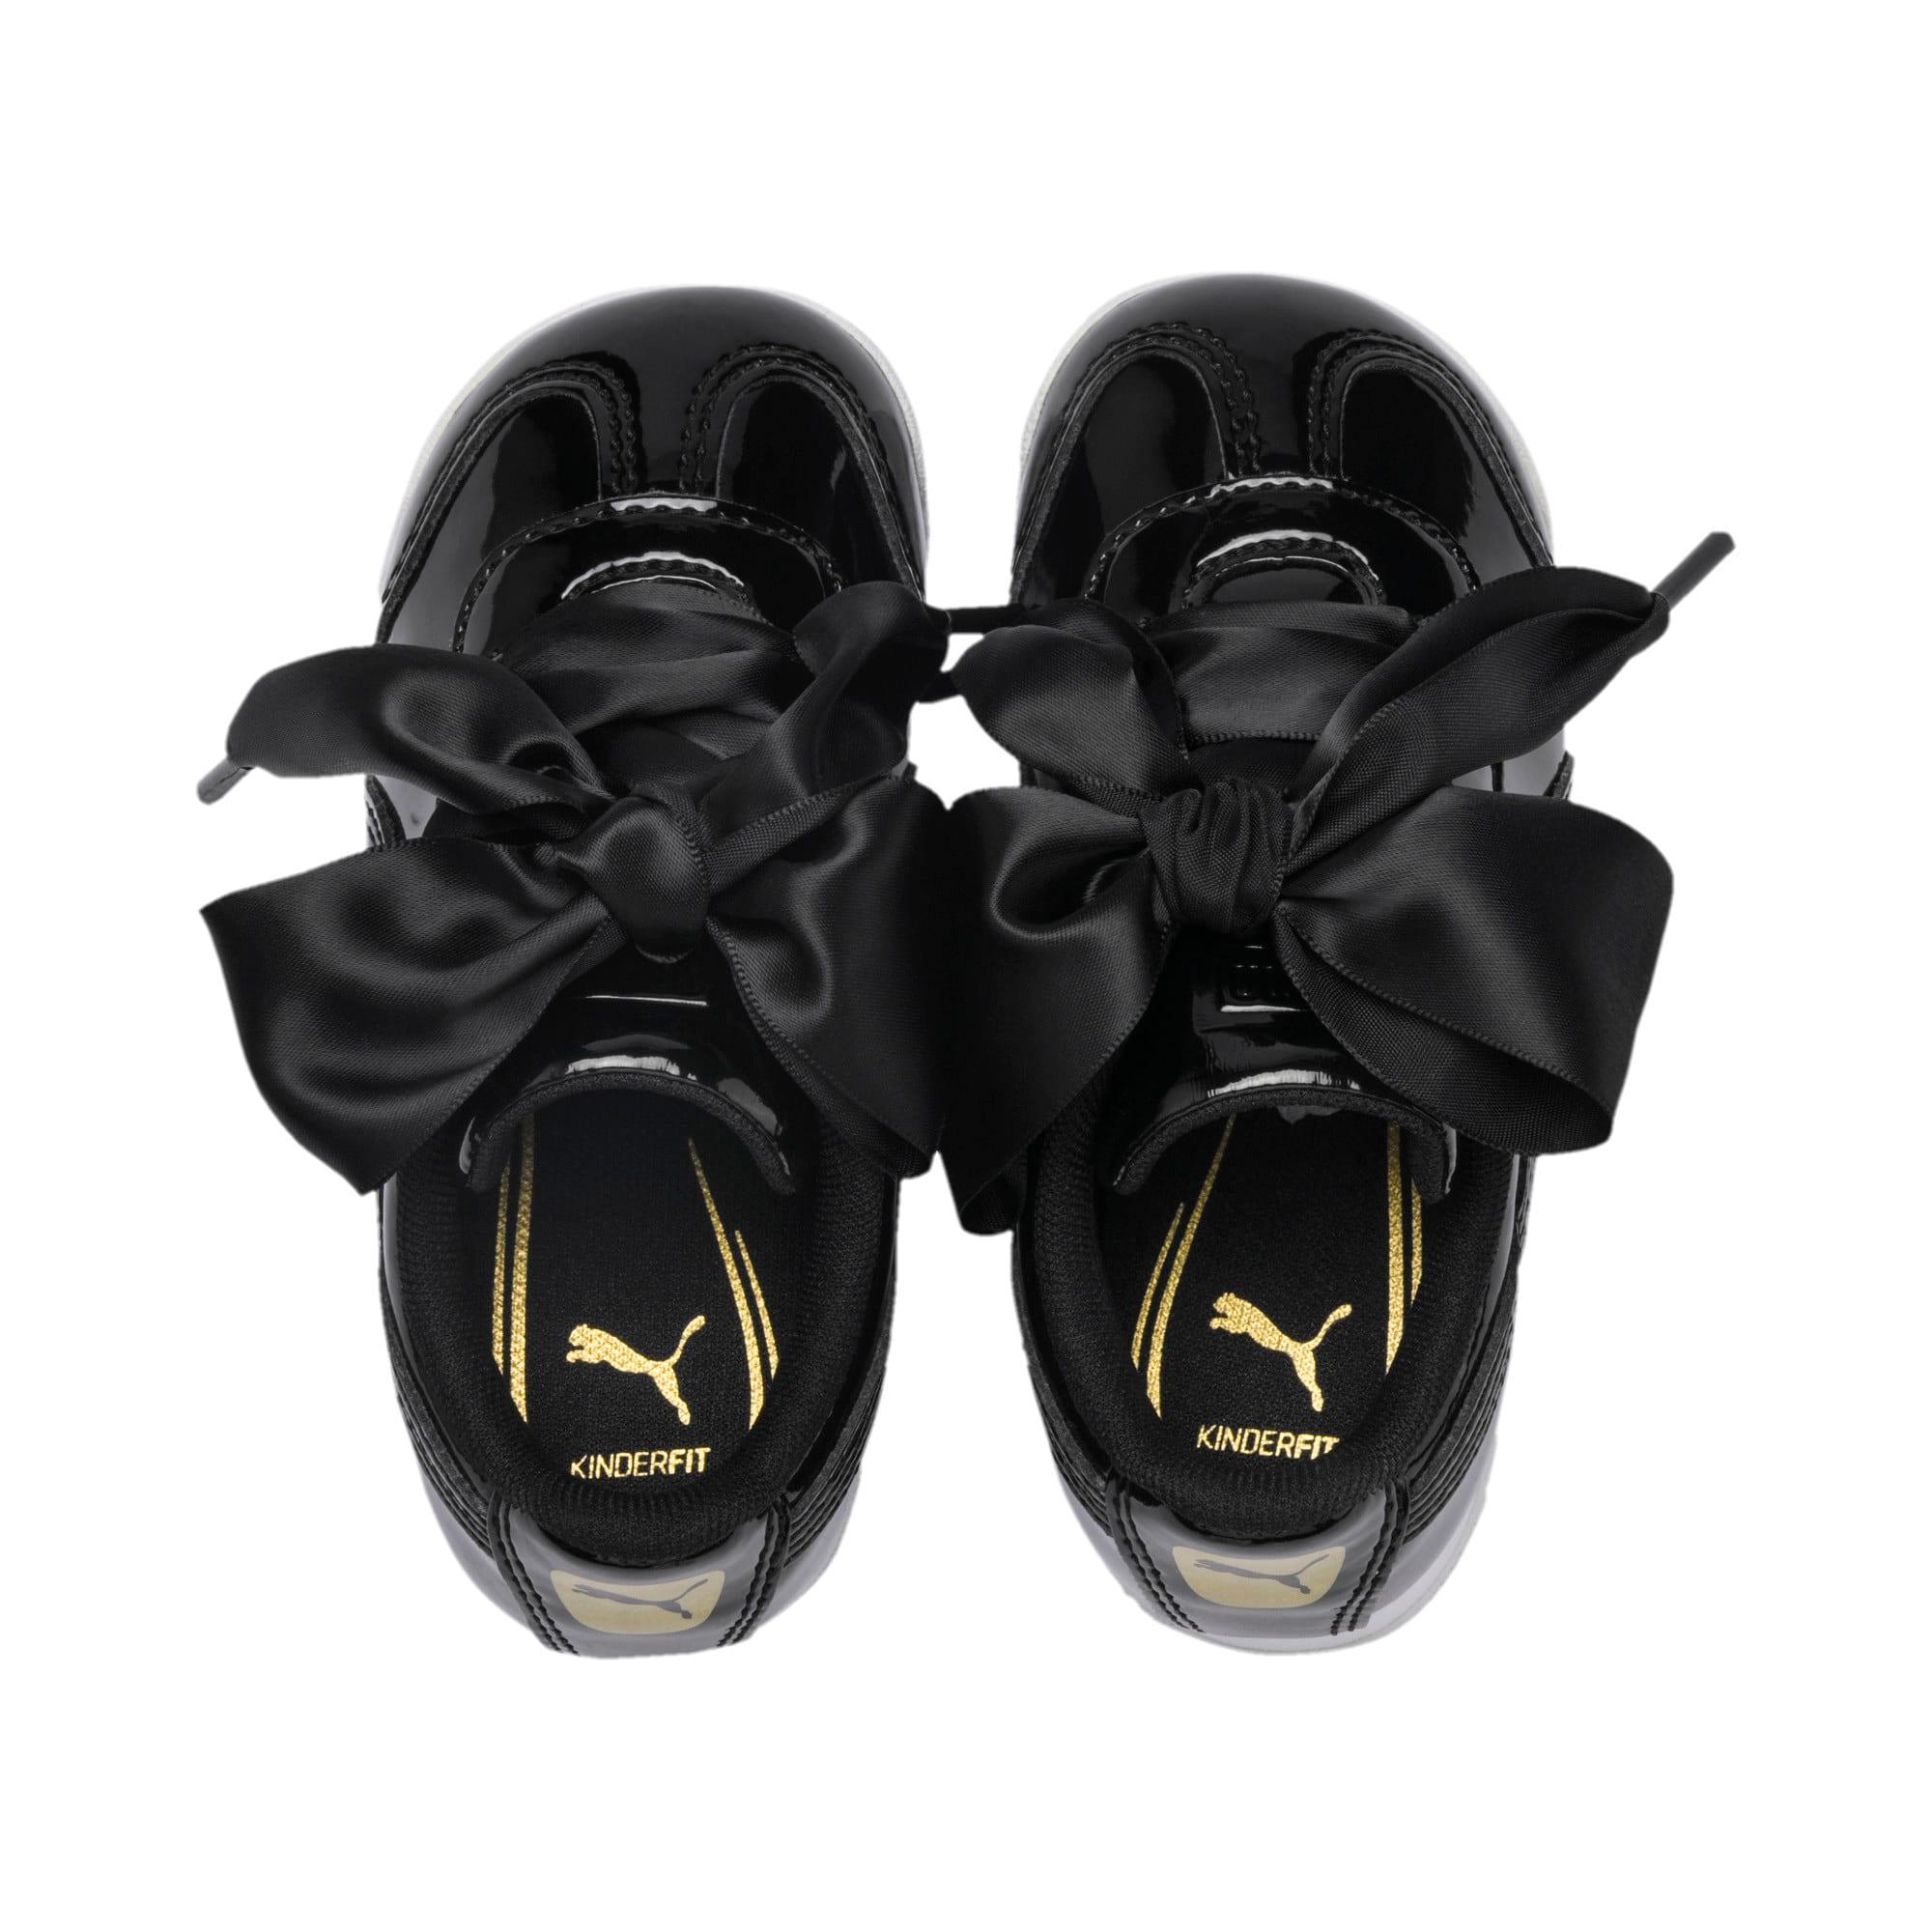 Thumbnail 6 of Roma Heart Patent Toddler Shoes, Puma Black, medium